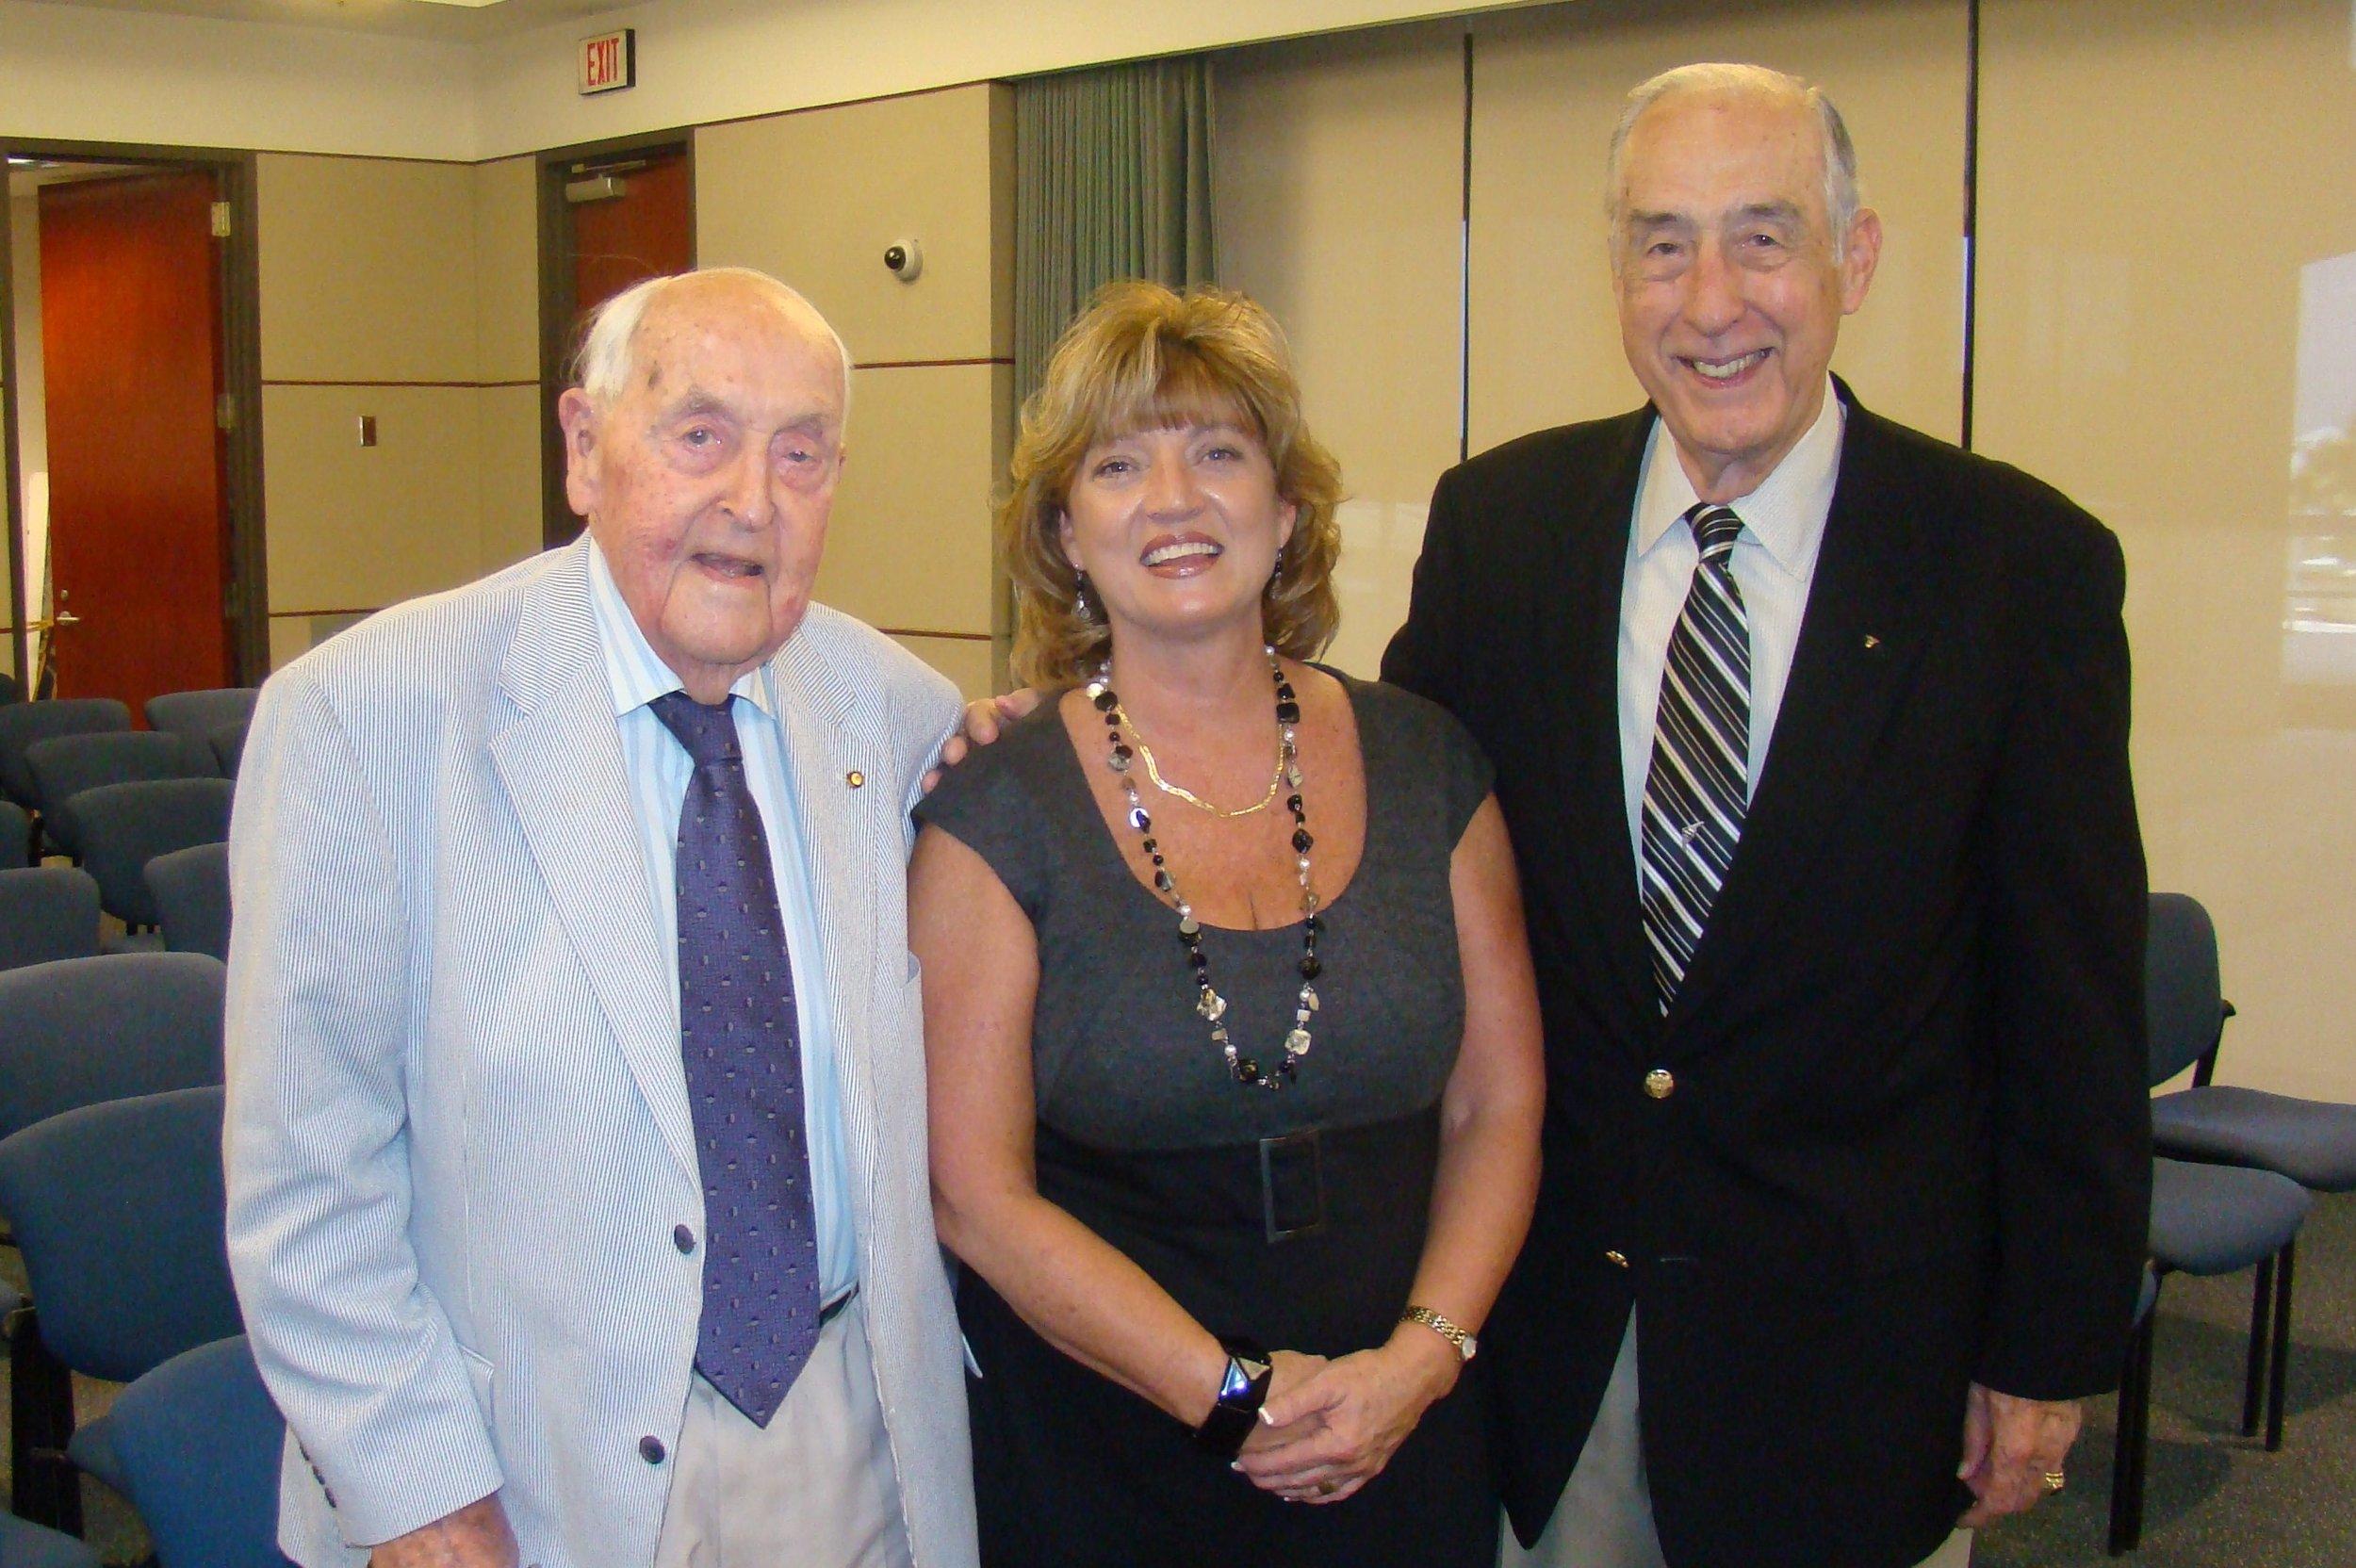 Sir Lenox, Colleen Picard & Dick Newton - 2, 27 Oct '11.JPG